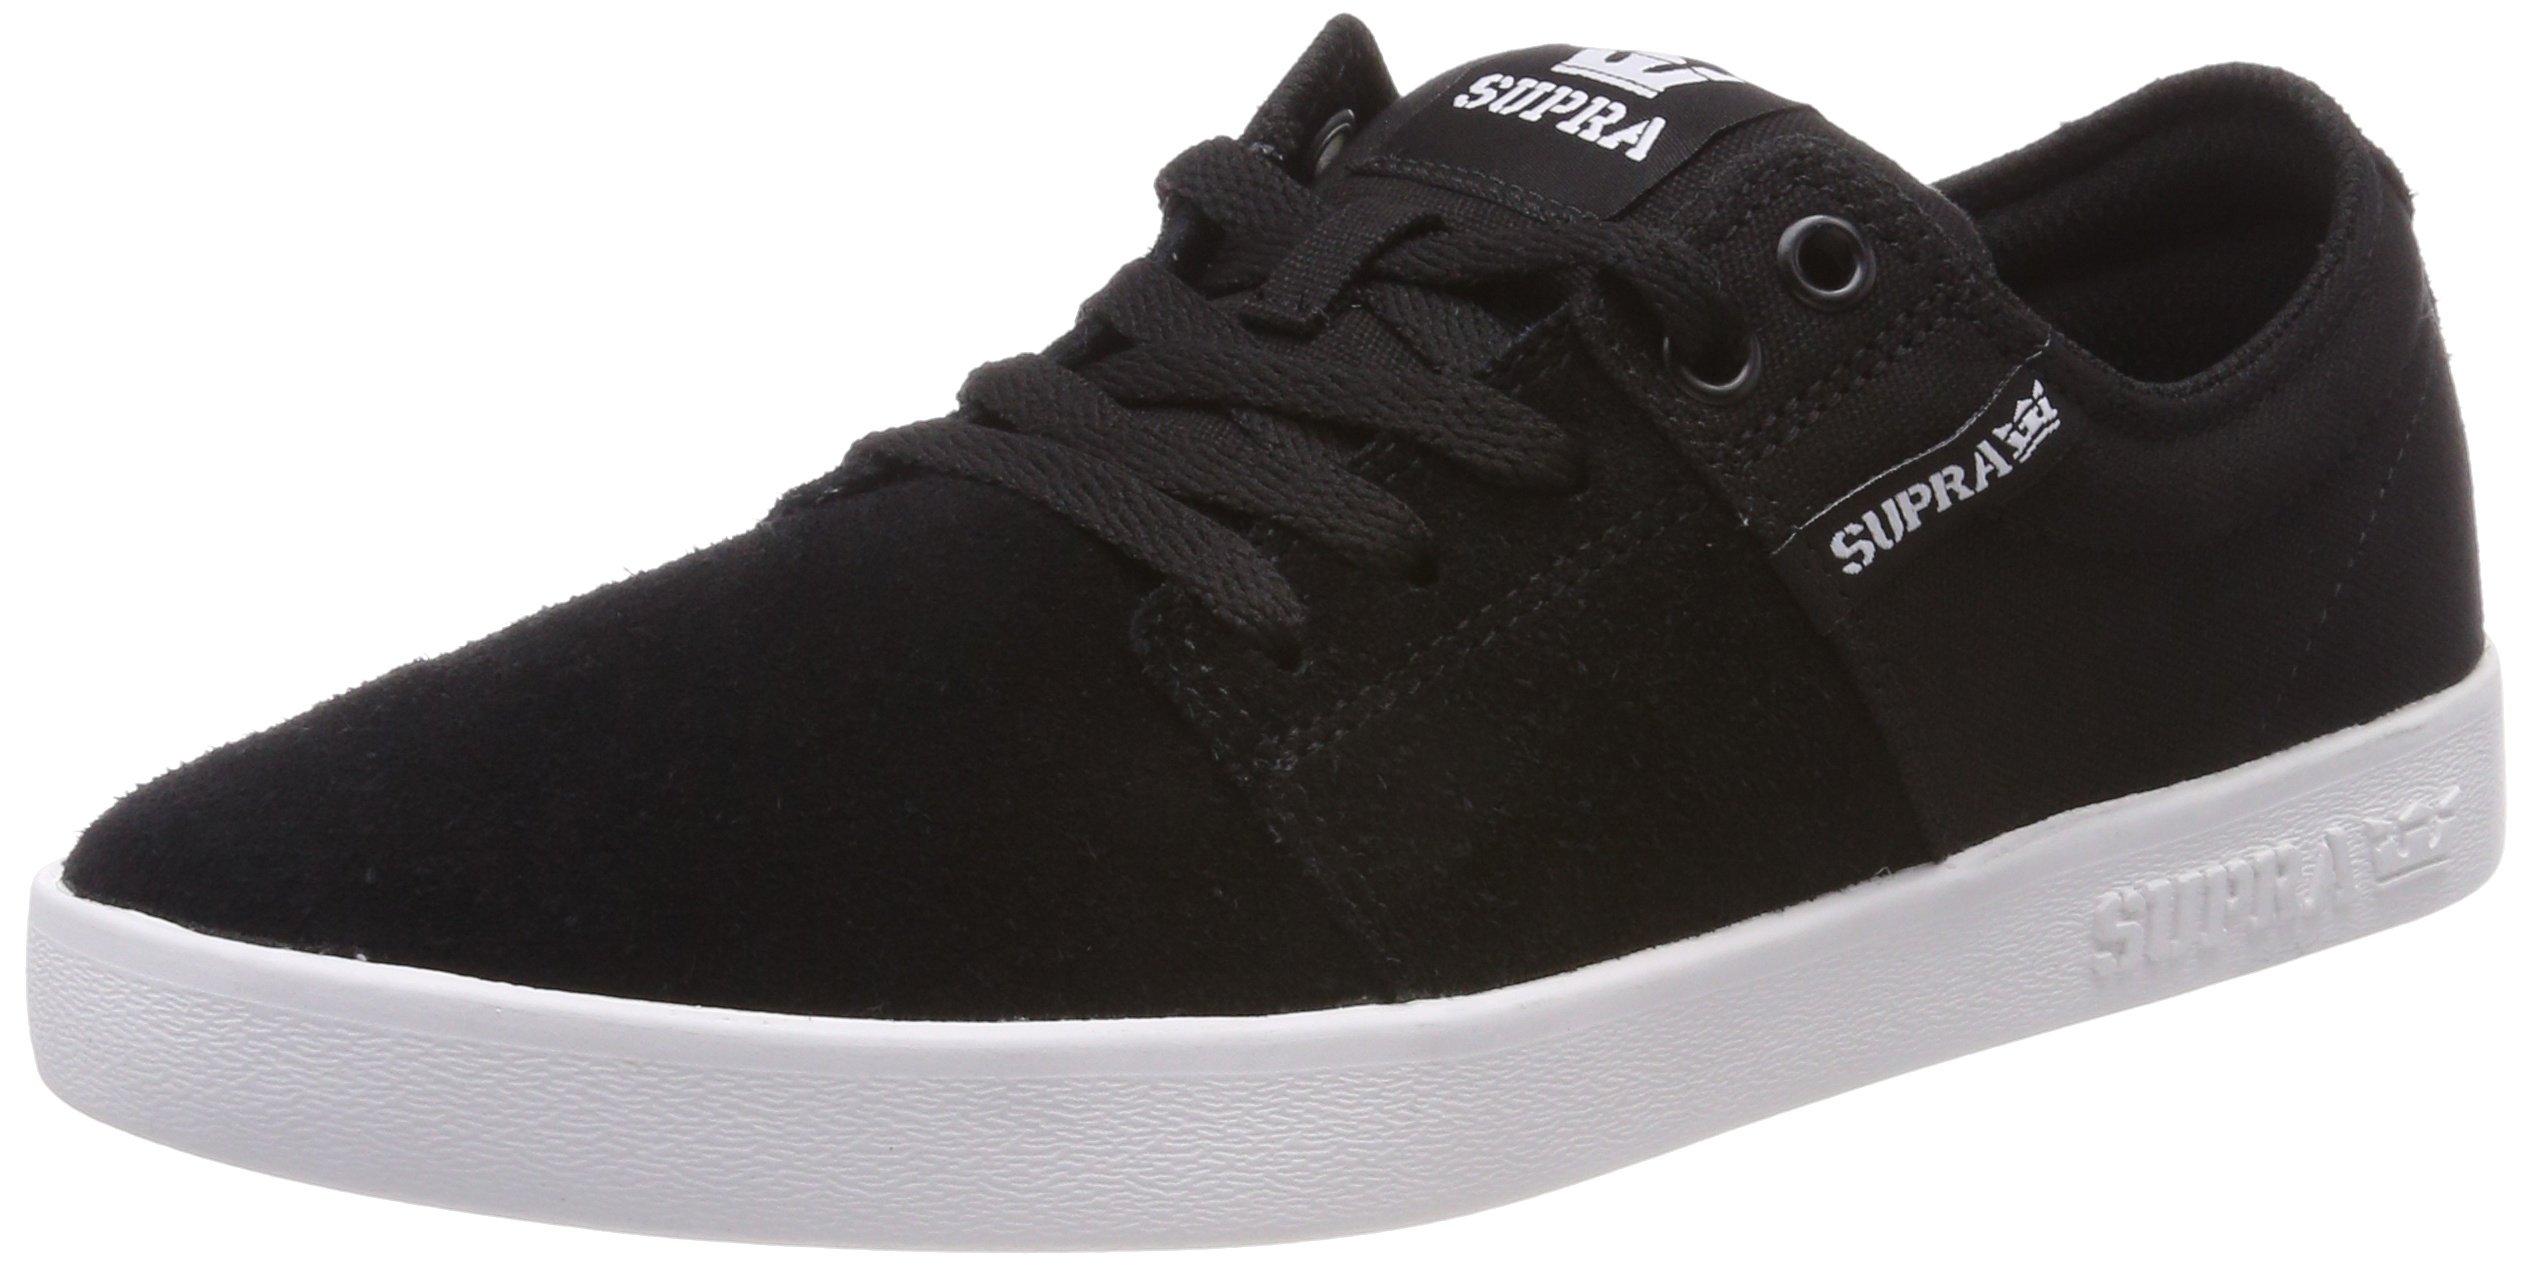 Supra Stacks II Skate Shoe, Black/Grey-White, 13 Regular US